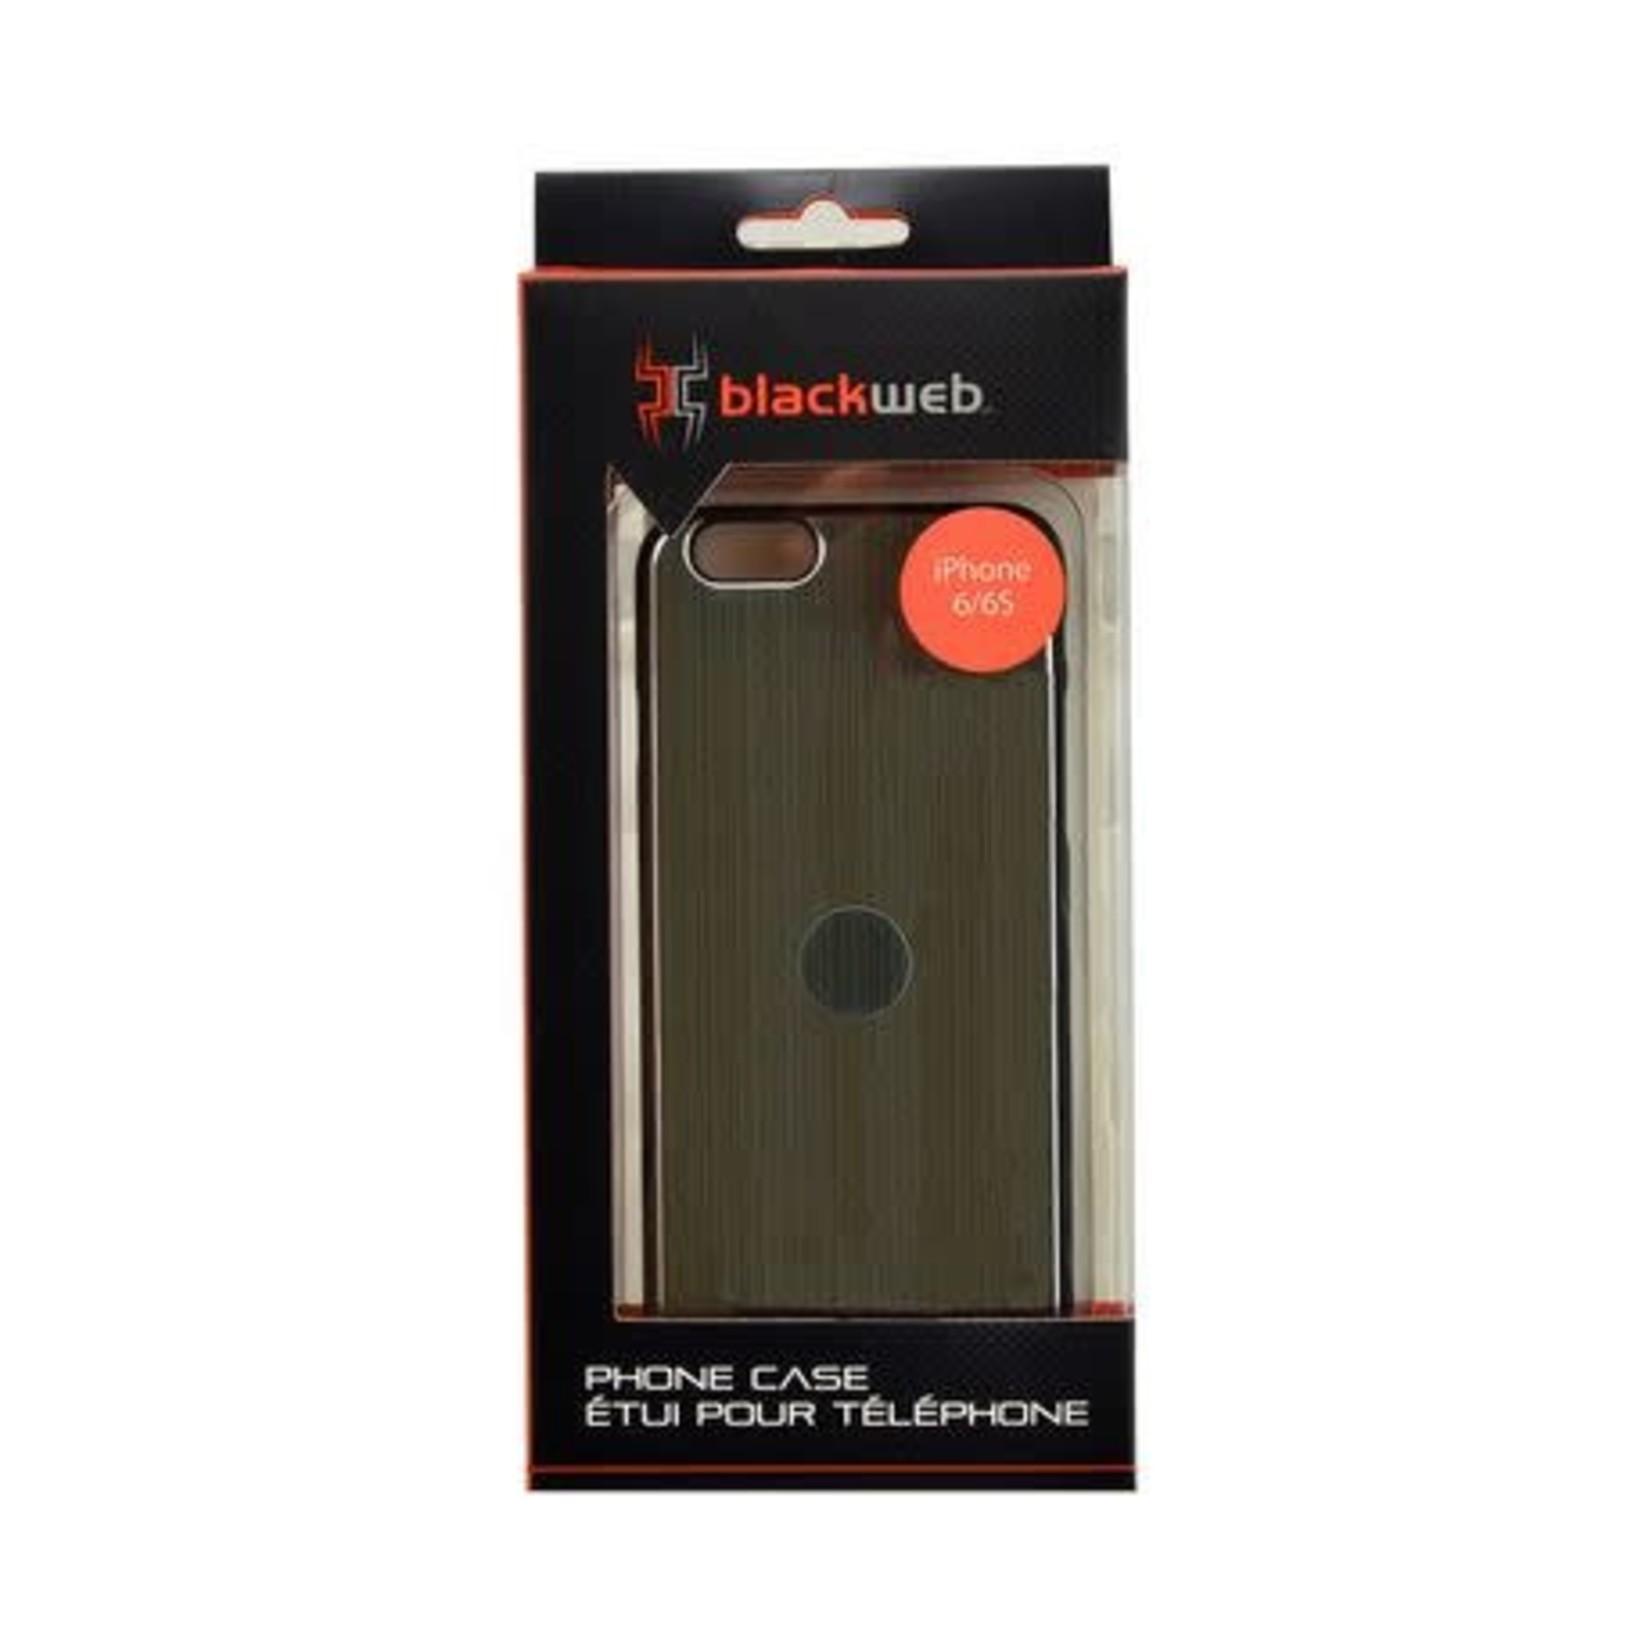 Blackweb iPhone 6/6S Phone Case